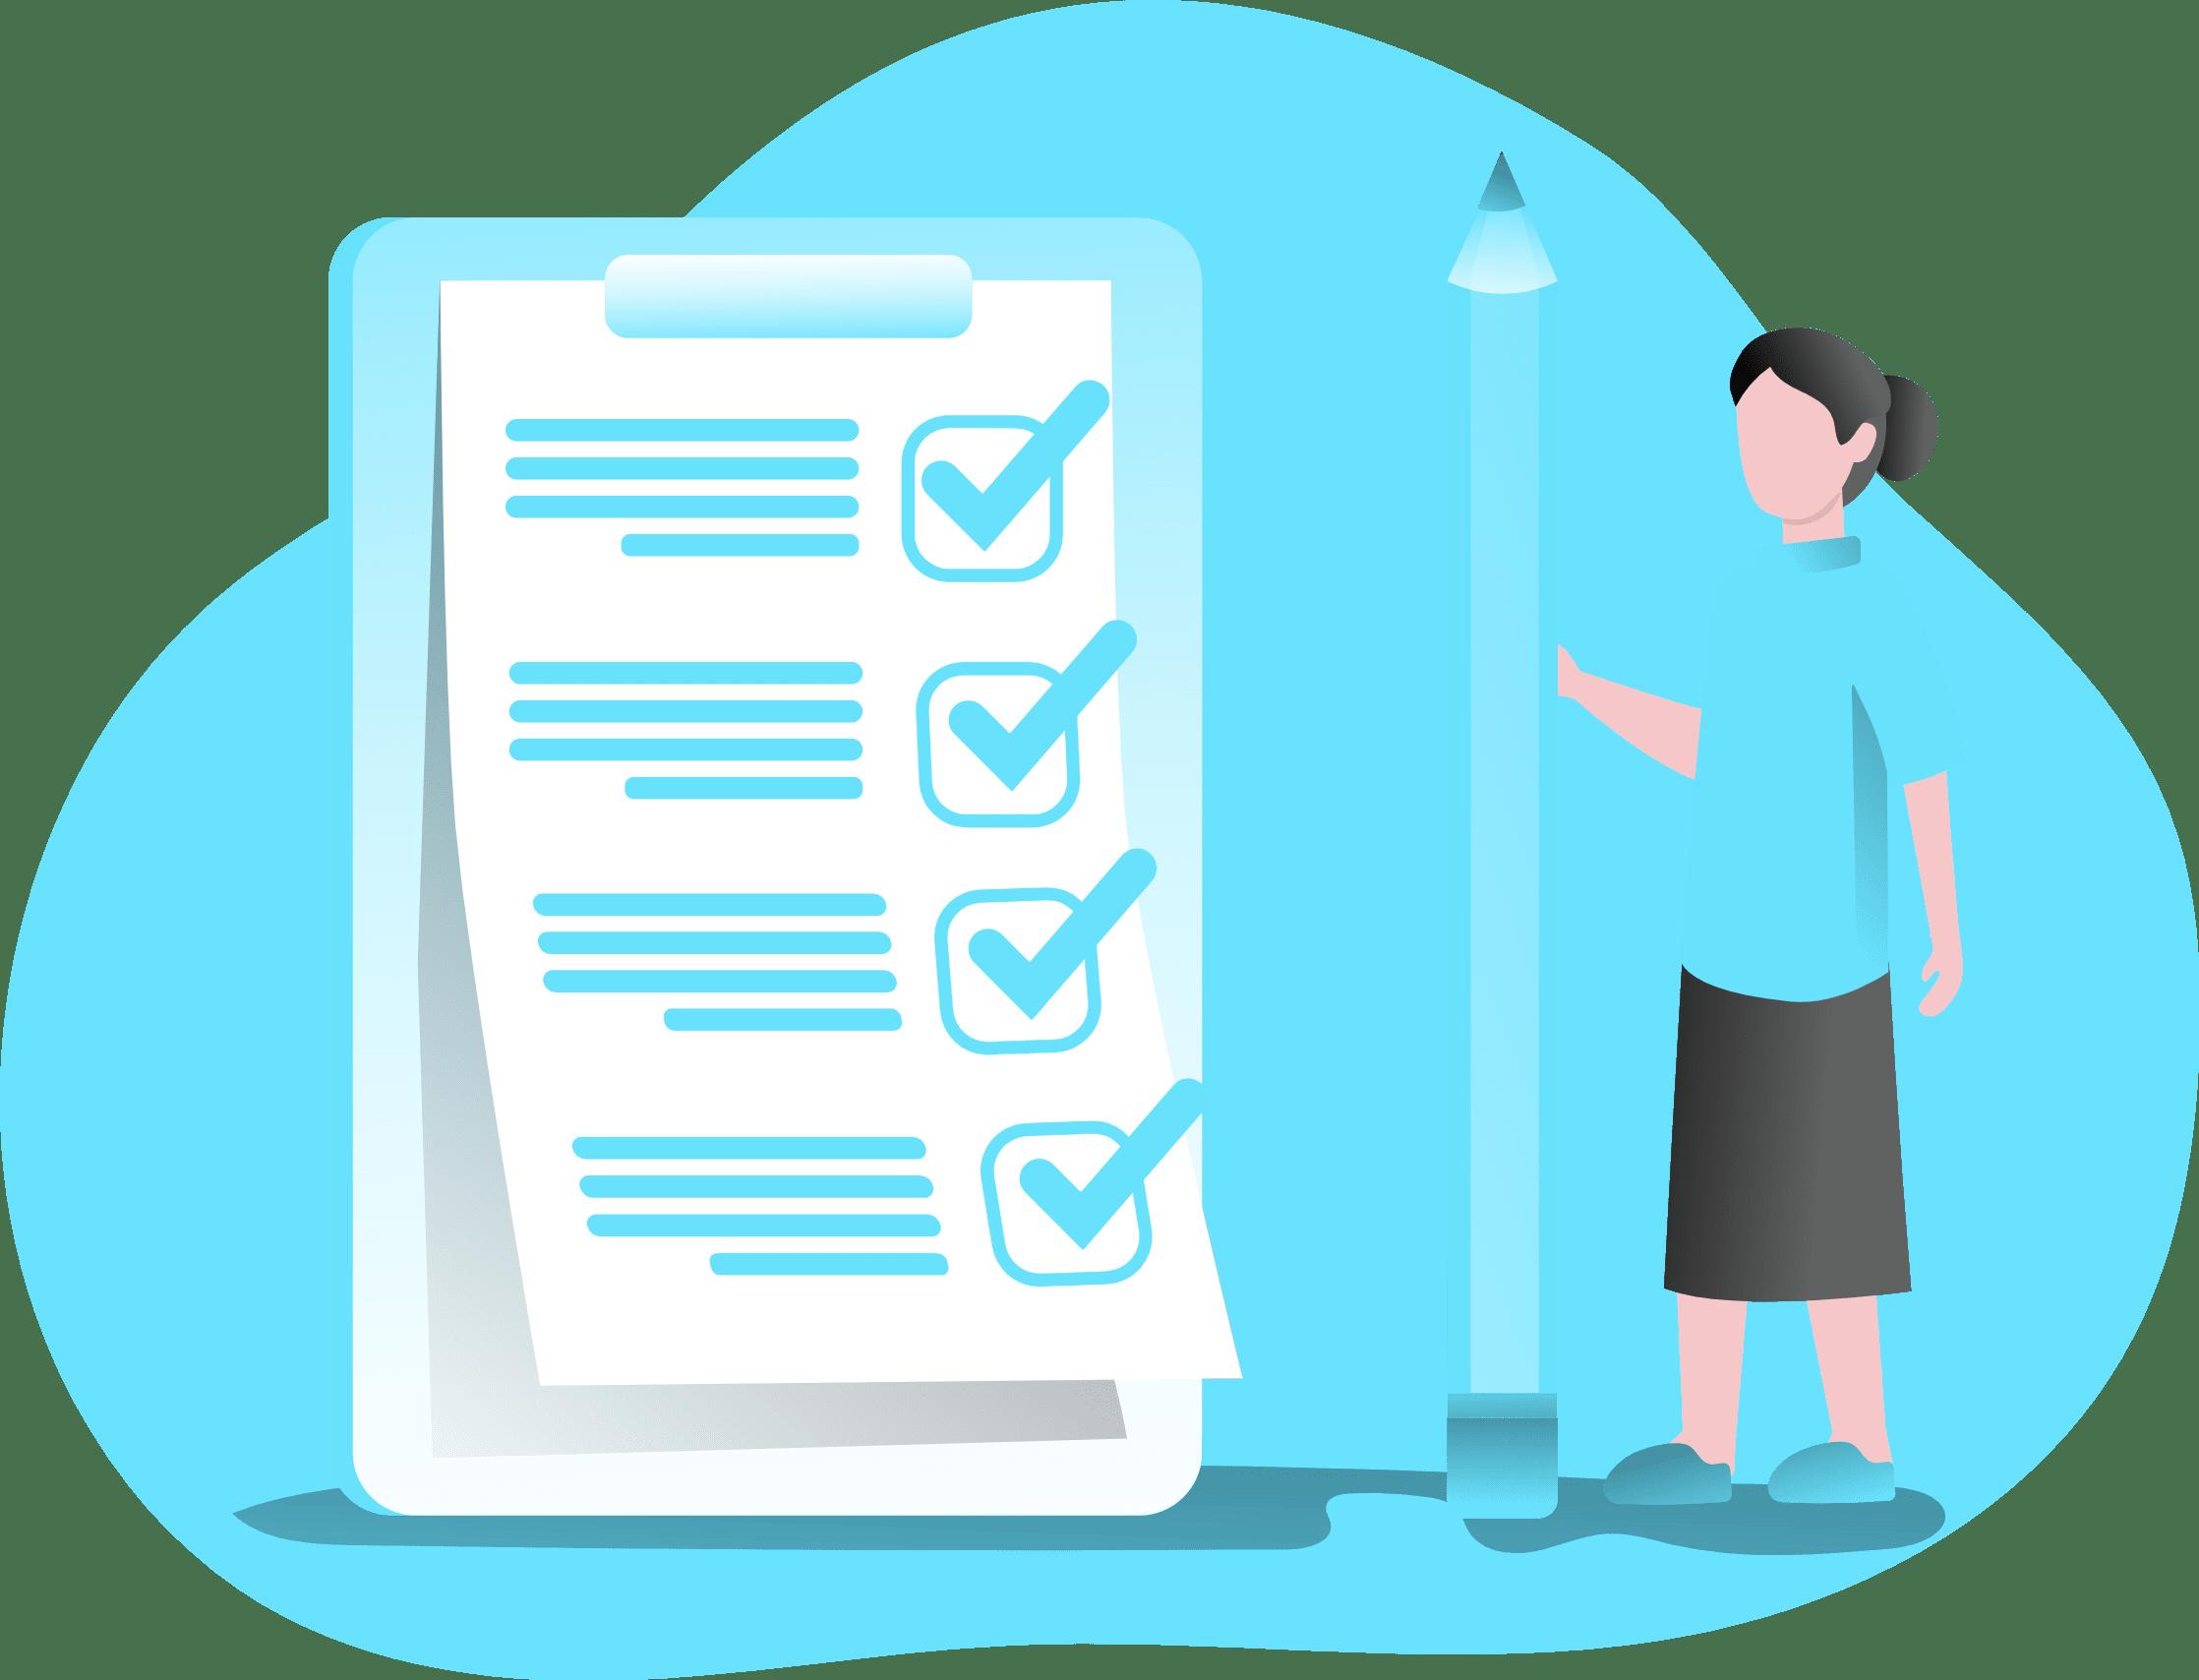 Time Management - Small Business - Web Design - Task Management